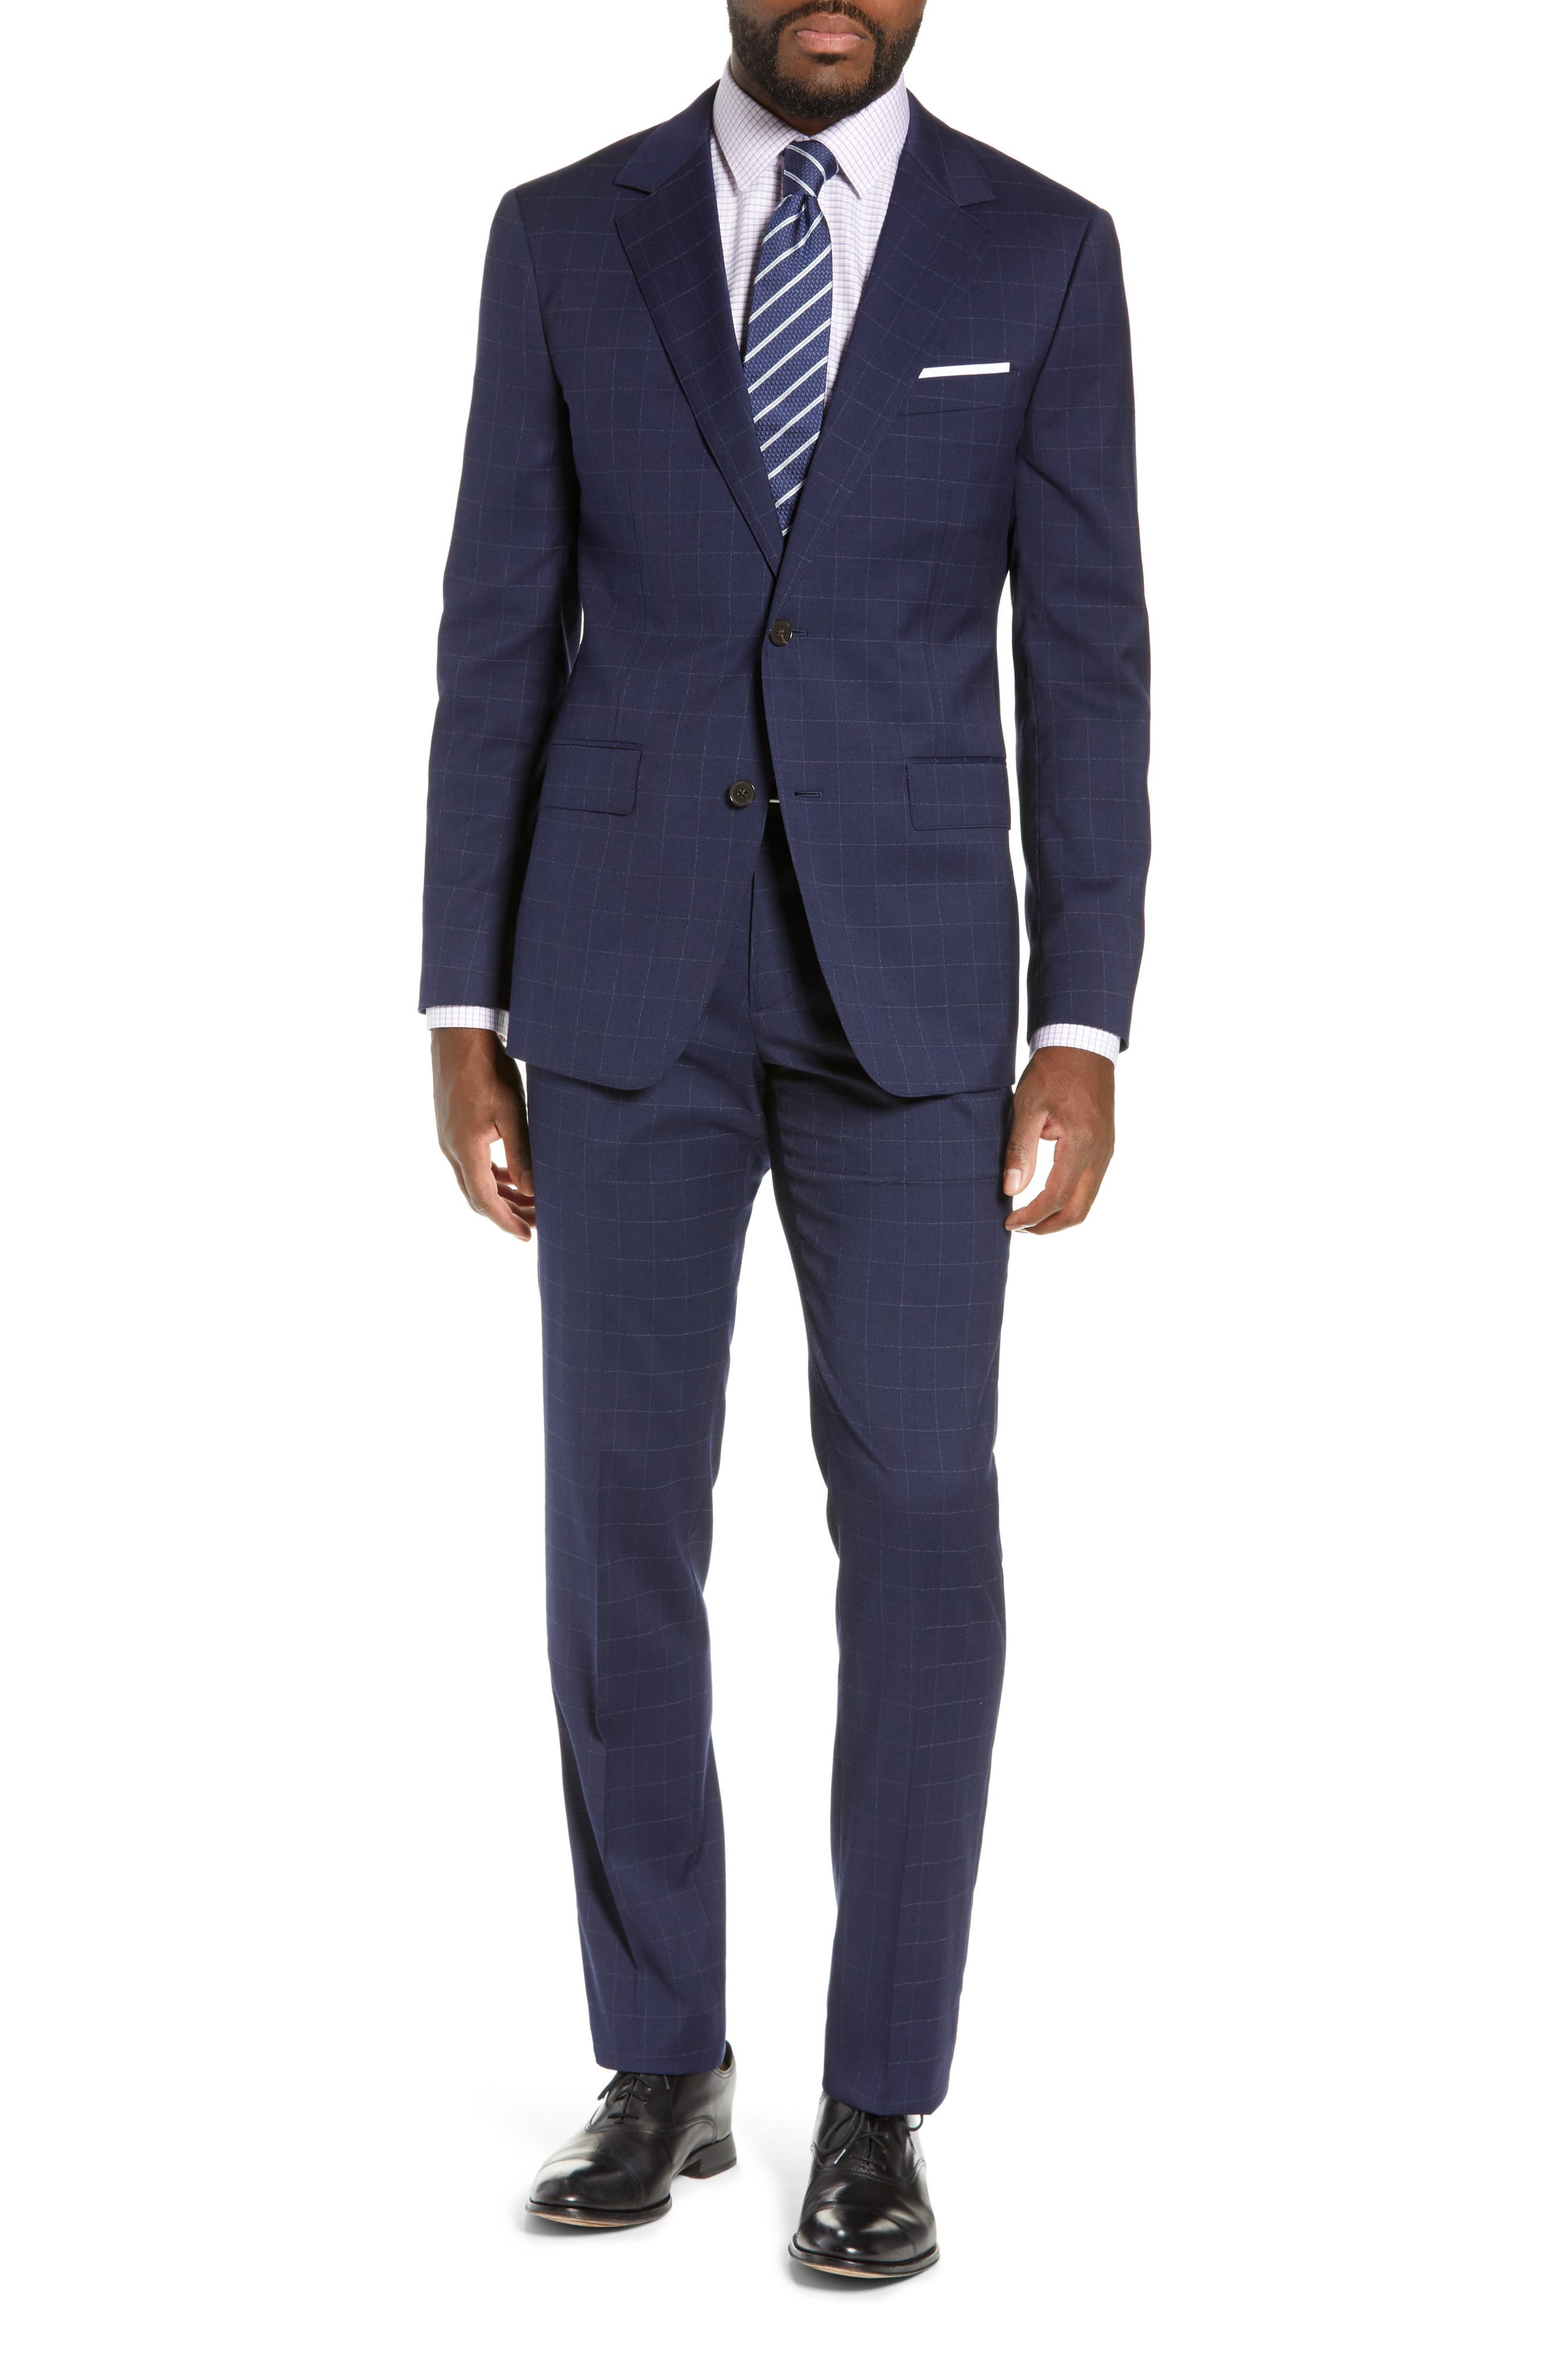 Jetsetter Slim Fit Stretch Suit Pants,                             Alternate thumbnail 7, color,                             NAVY CHALK WINDOWPANE